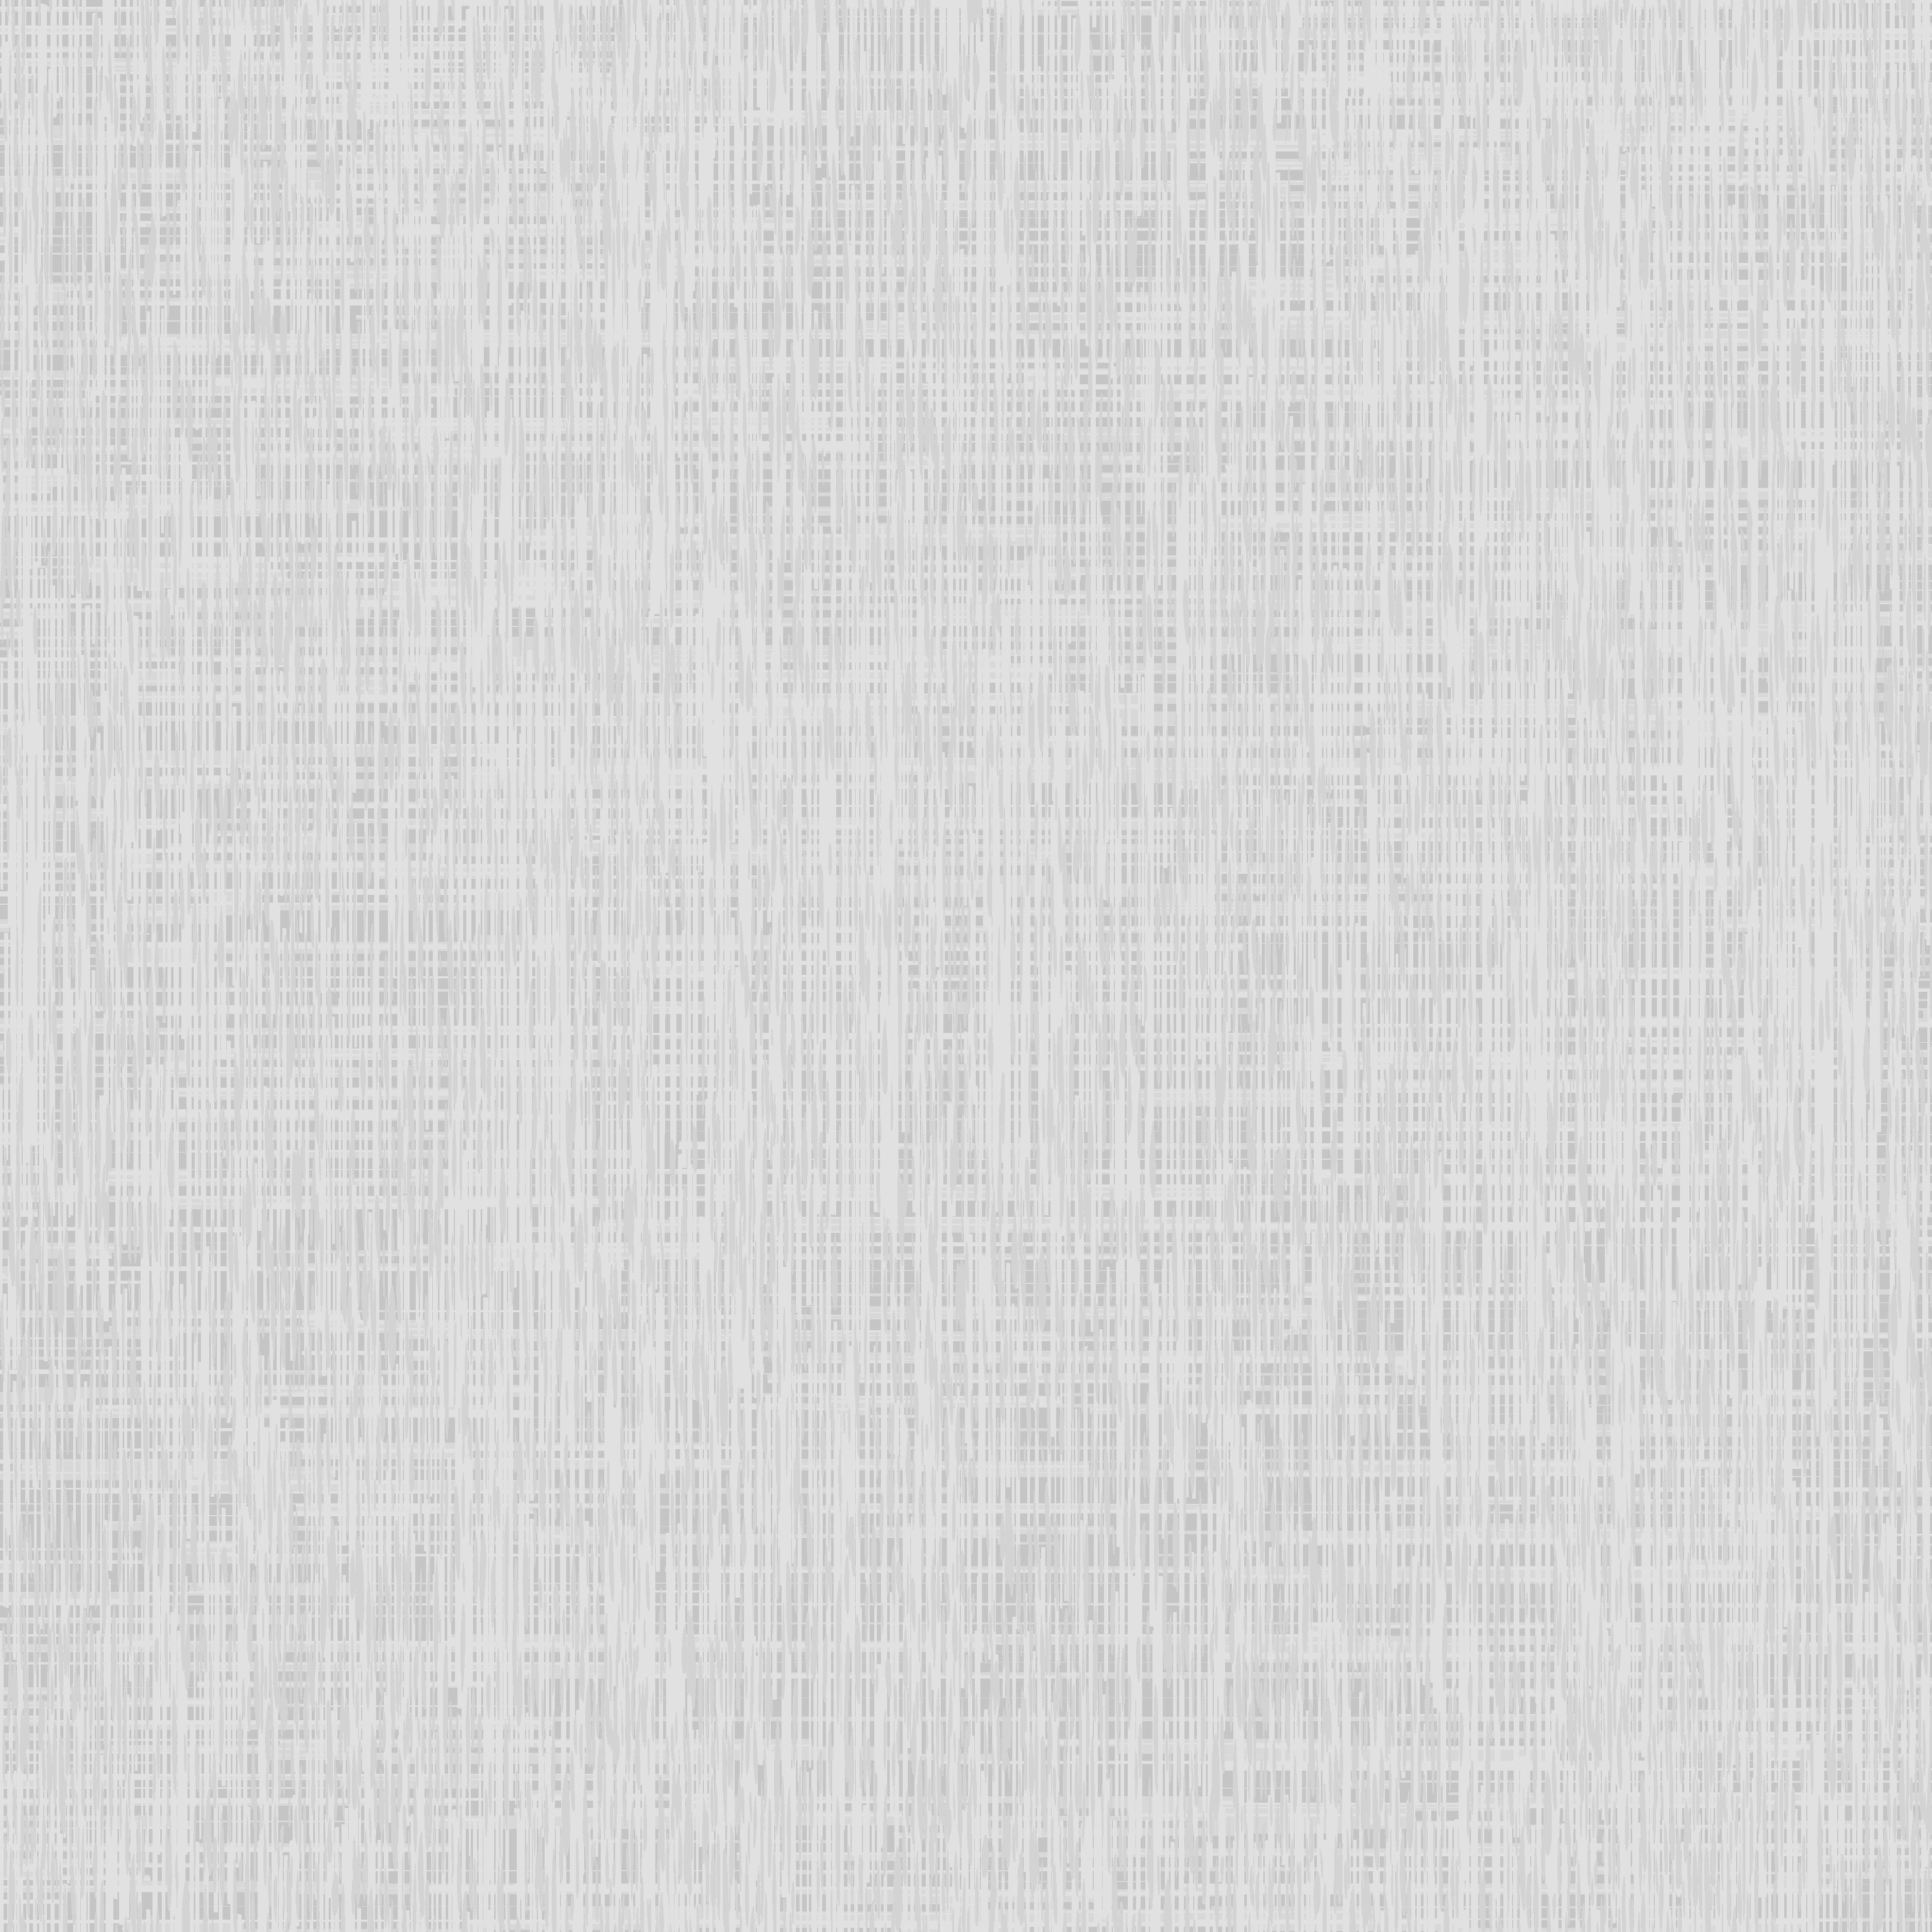 Linen paper texture